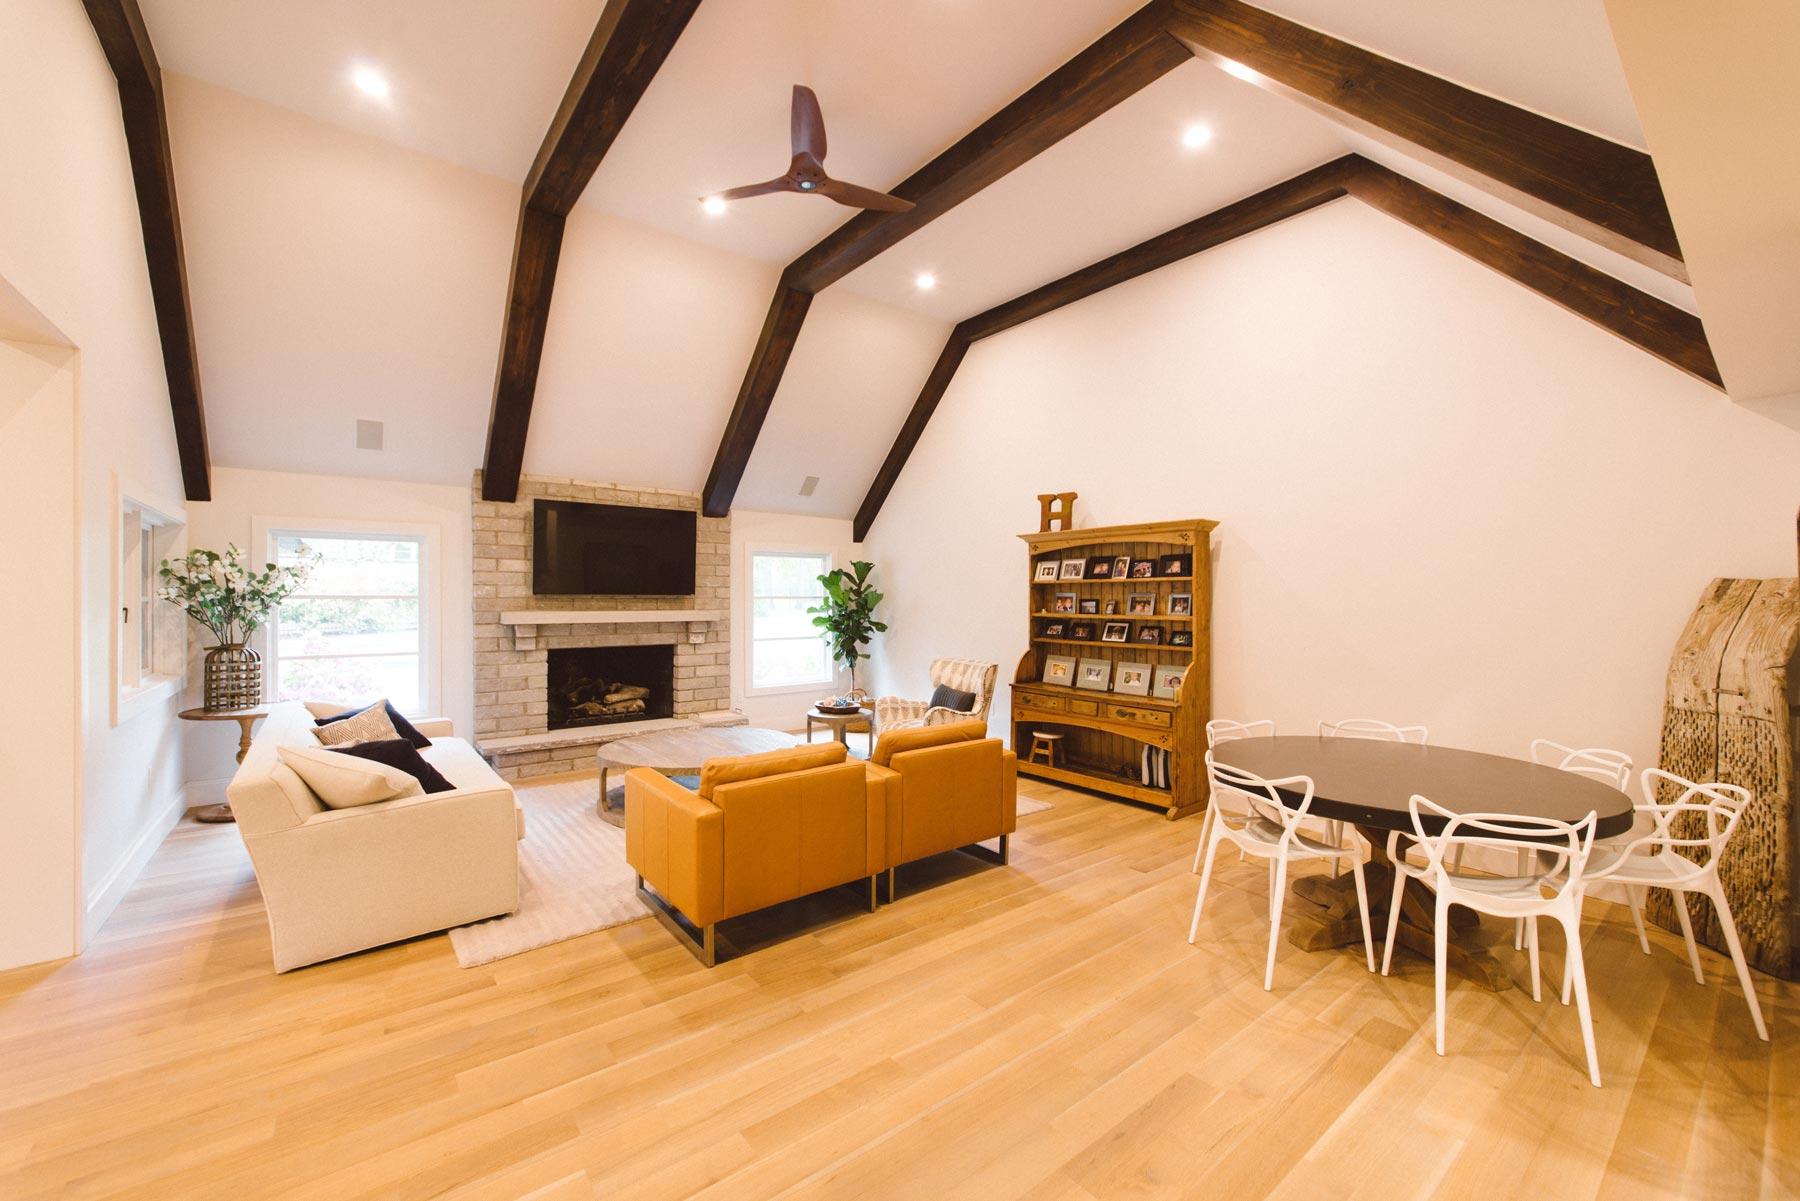 Bathroom Remodels Tulsa living room remodel | new living room designs | tulsa living room